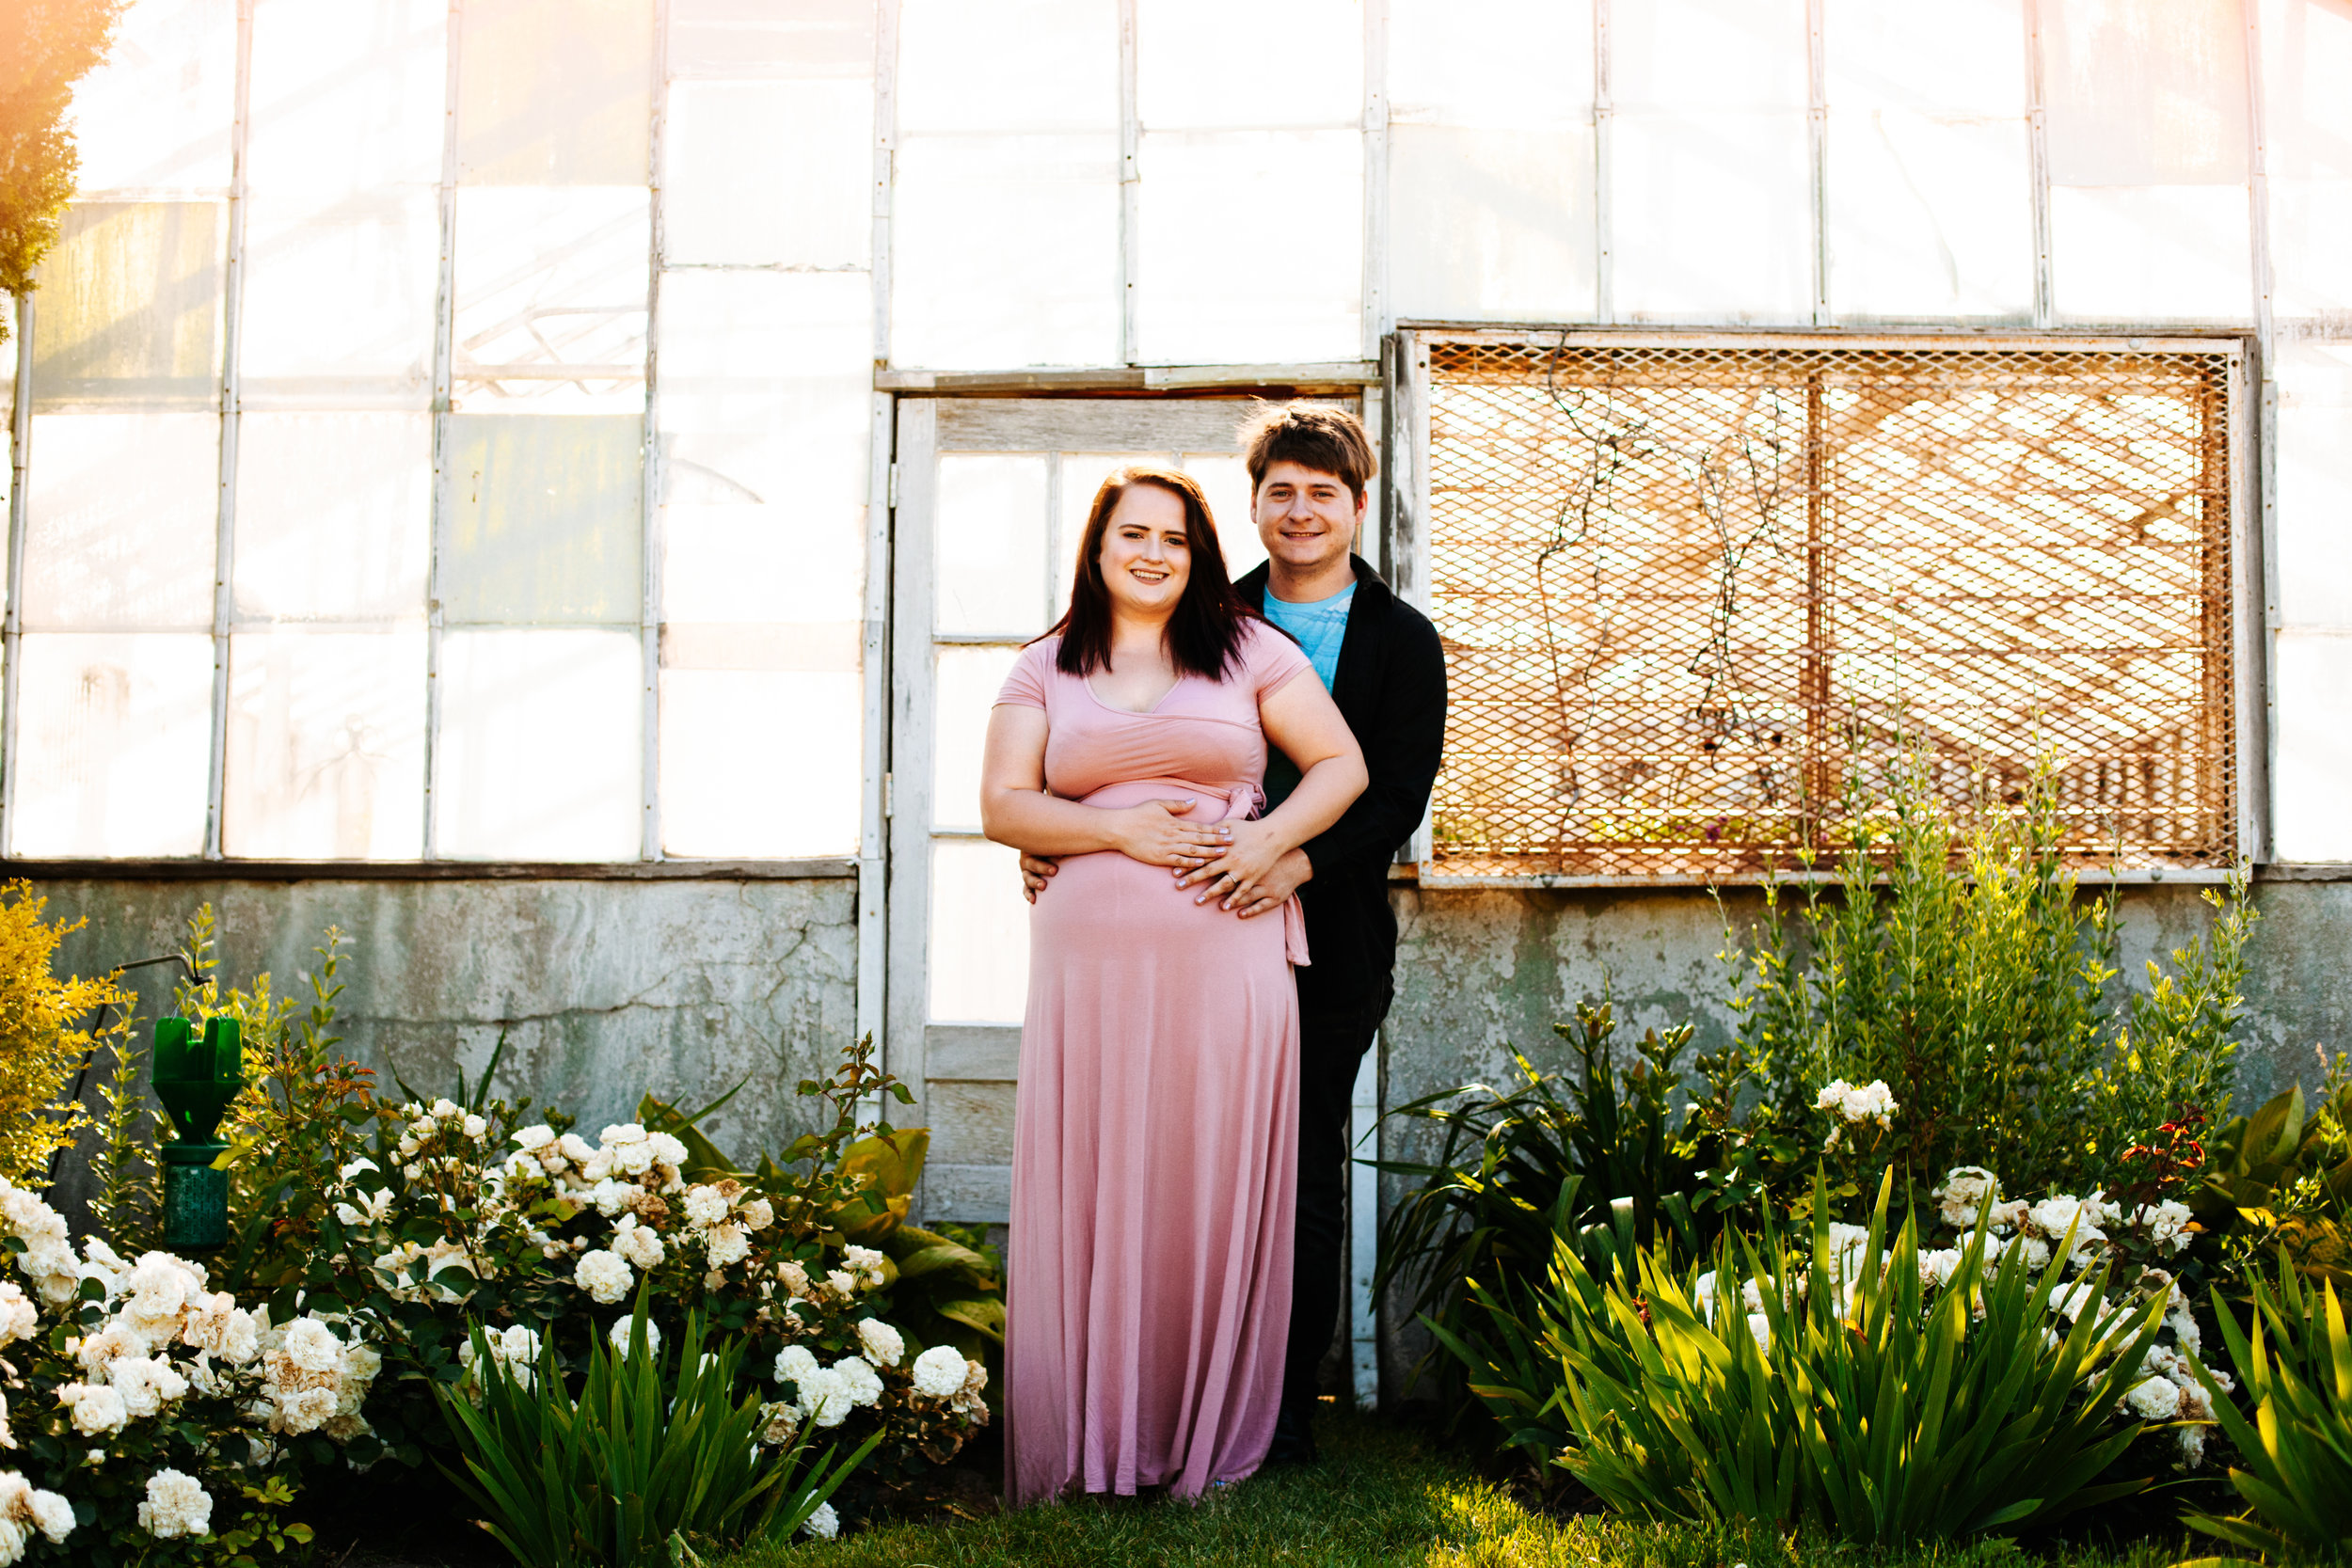 +Liberty Park +Utah Engagement Session +Salt Lake City Engagement Photographer +Utah Wedding Photographer +Marina Rey Photo-9172.jpg